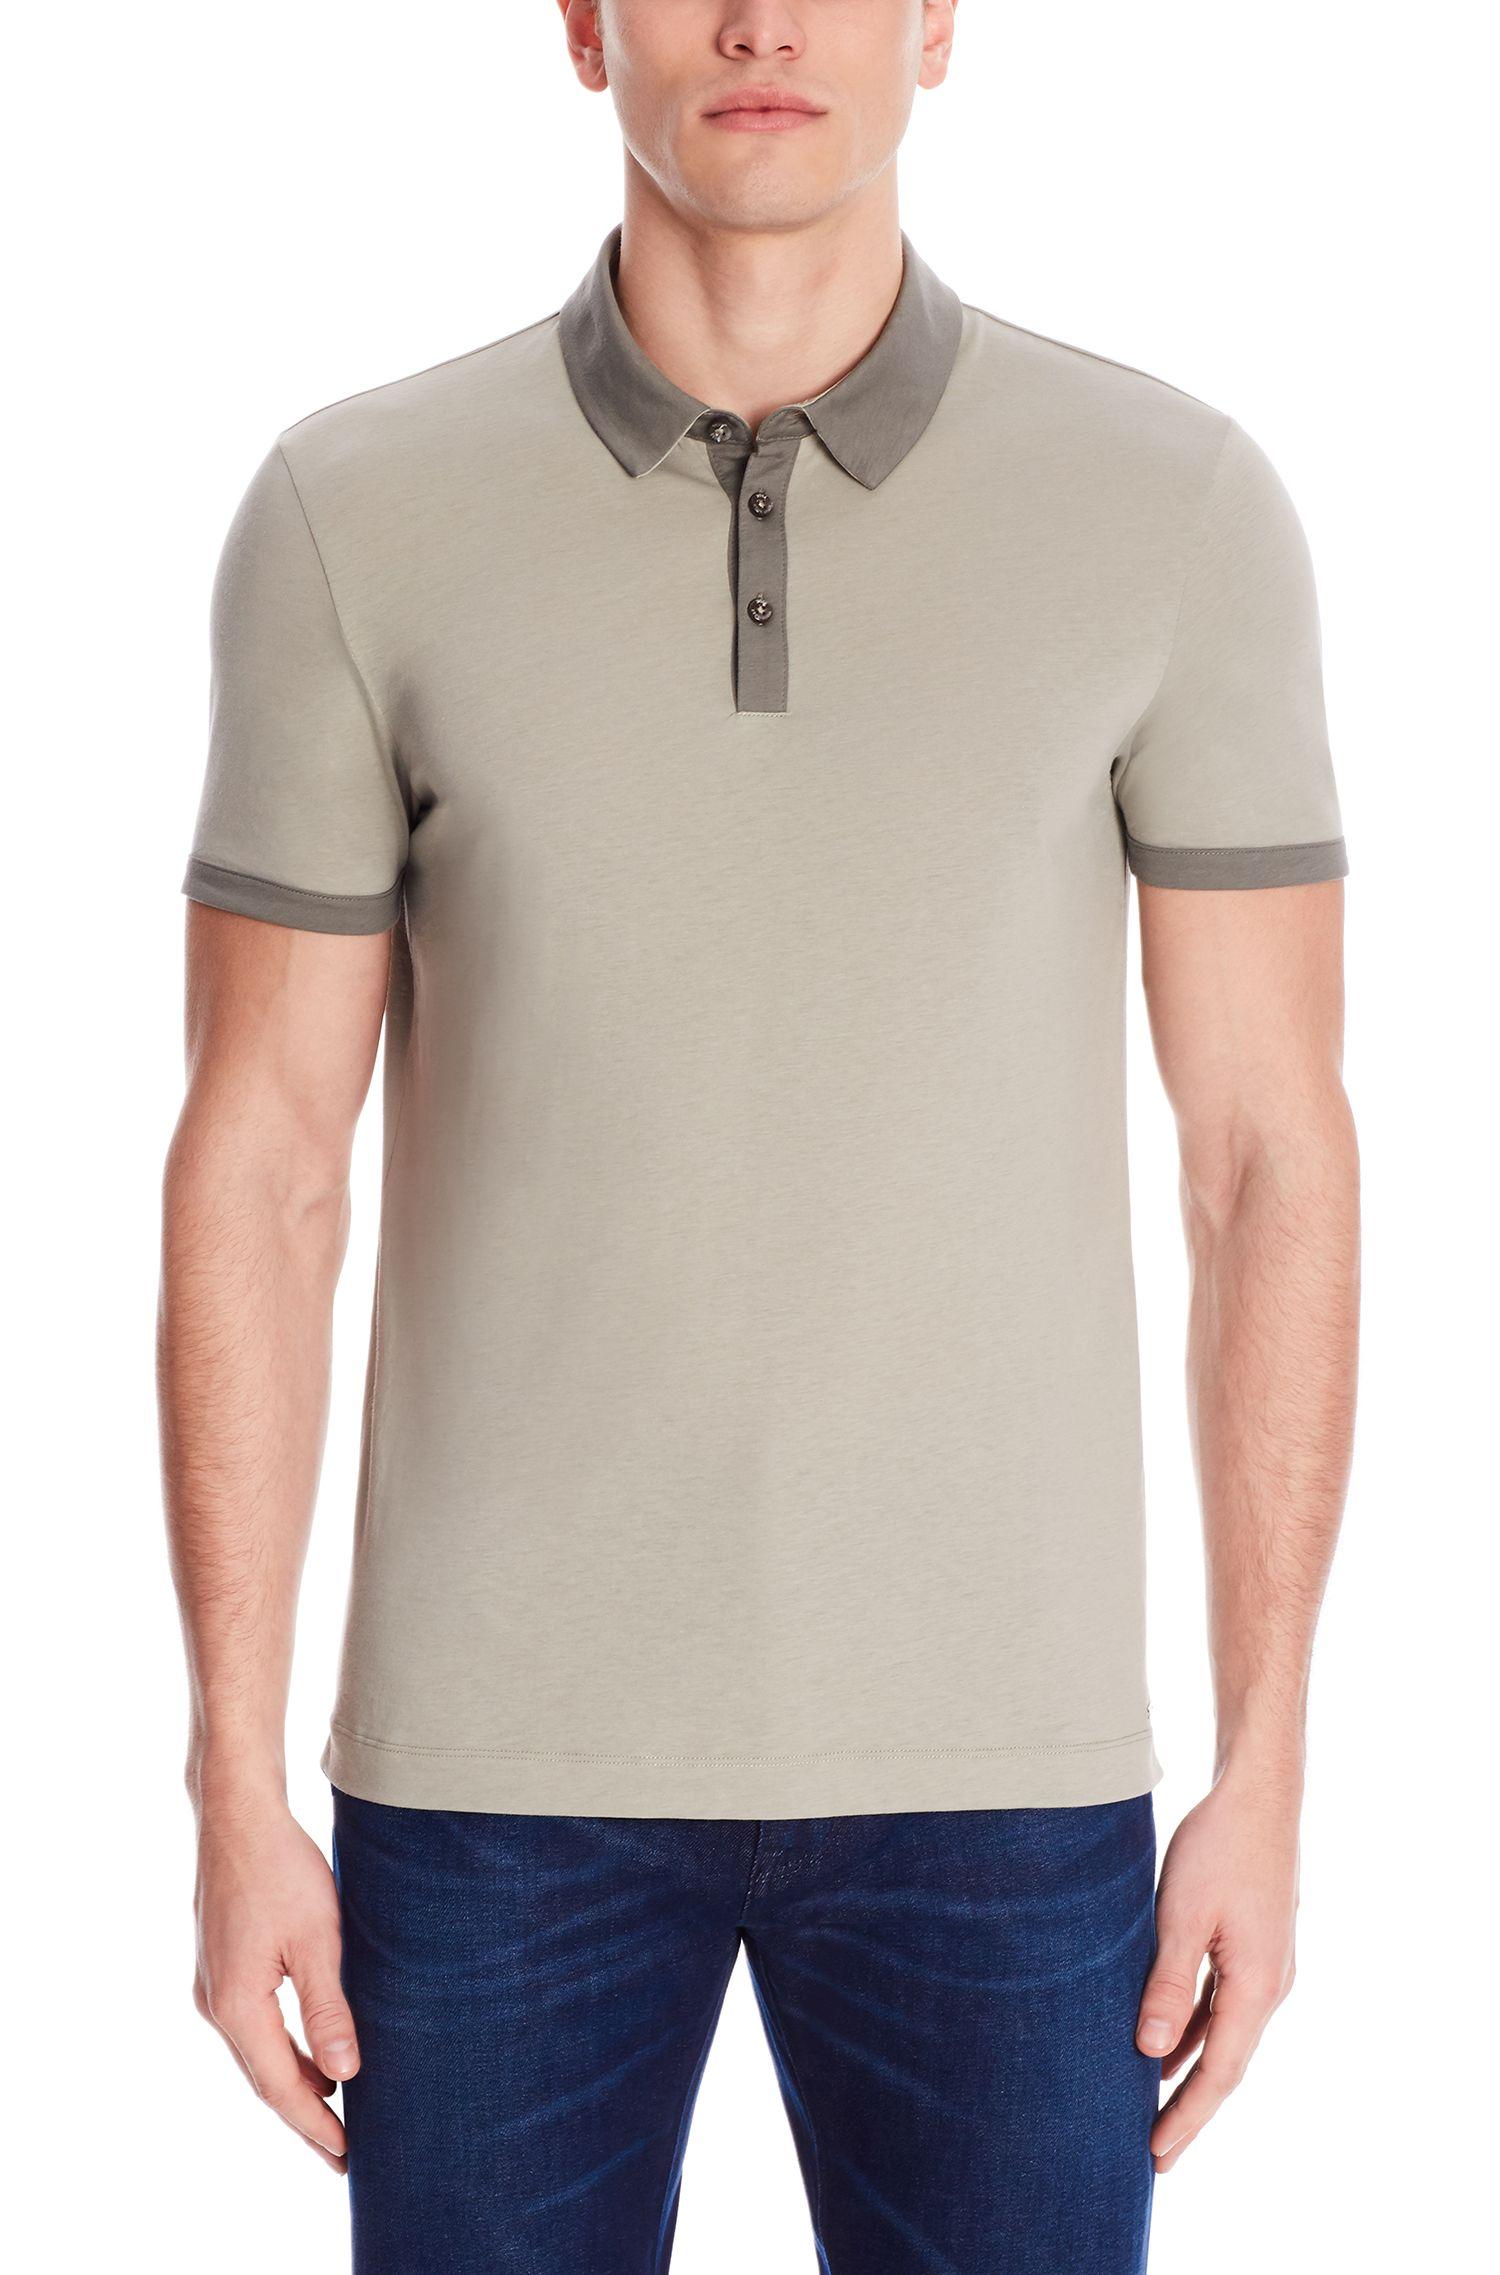 Cotton Jersey Polo Shirt, Slim FIt | Platt